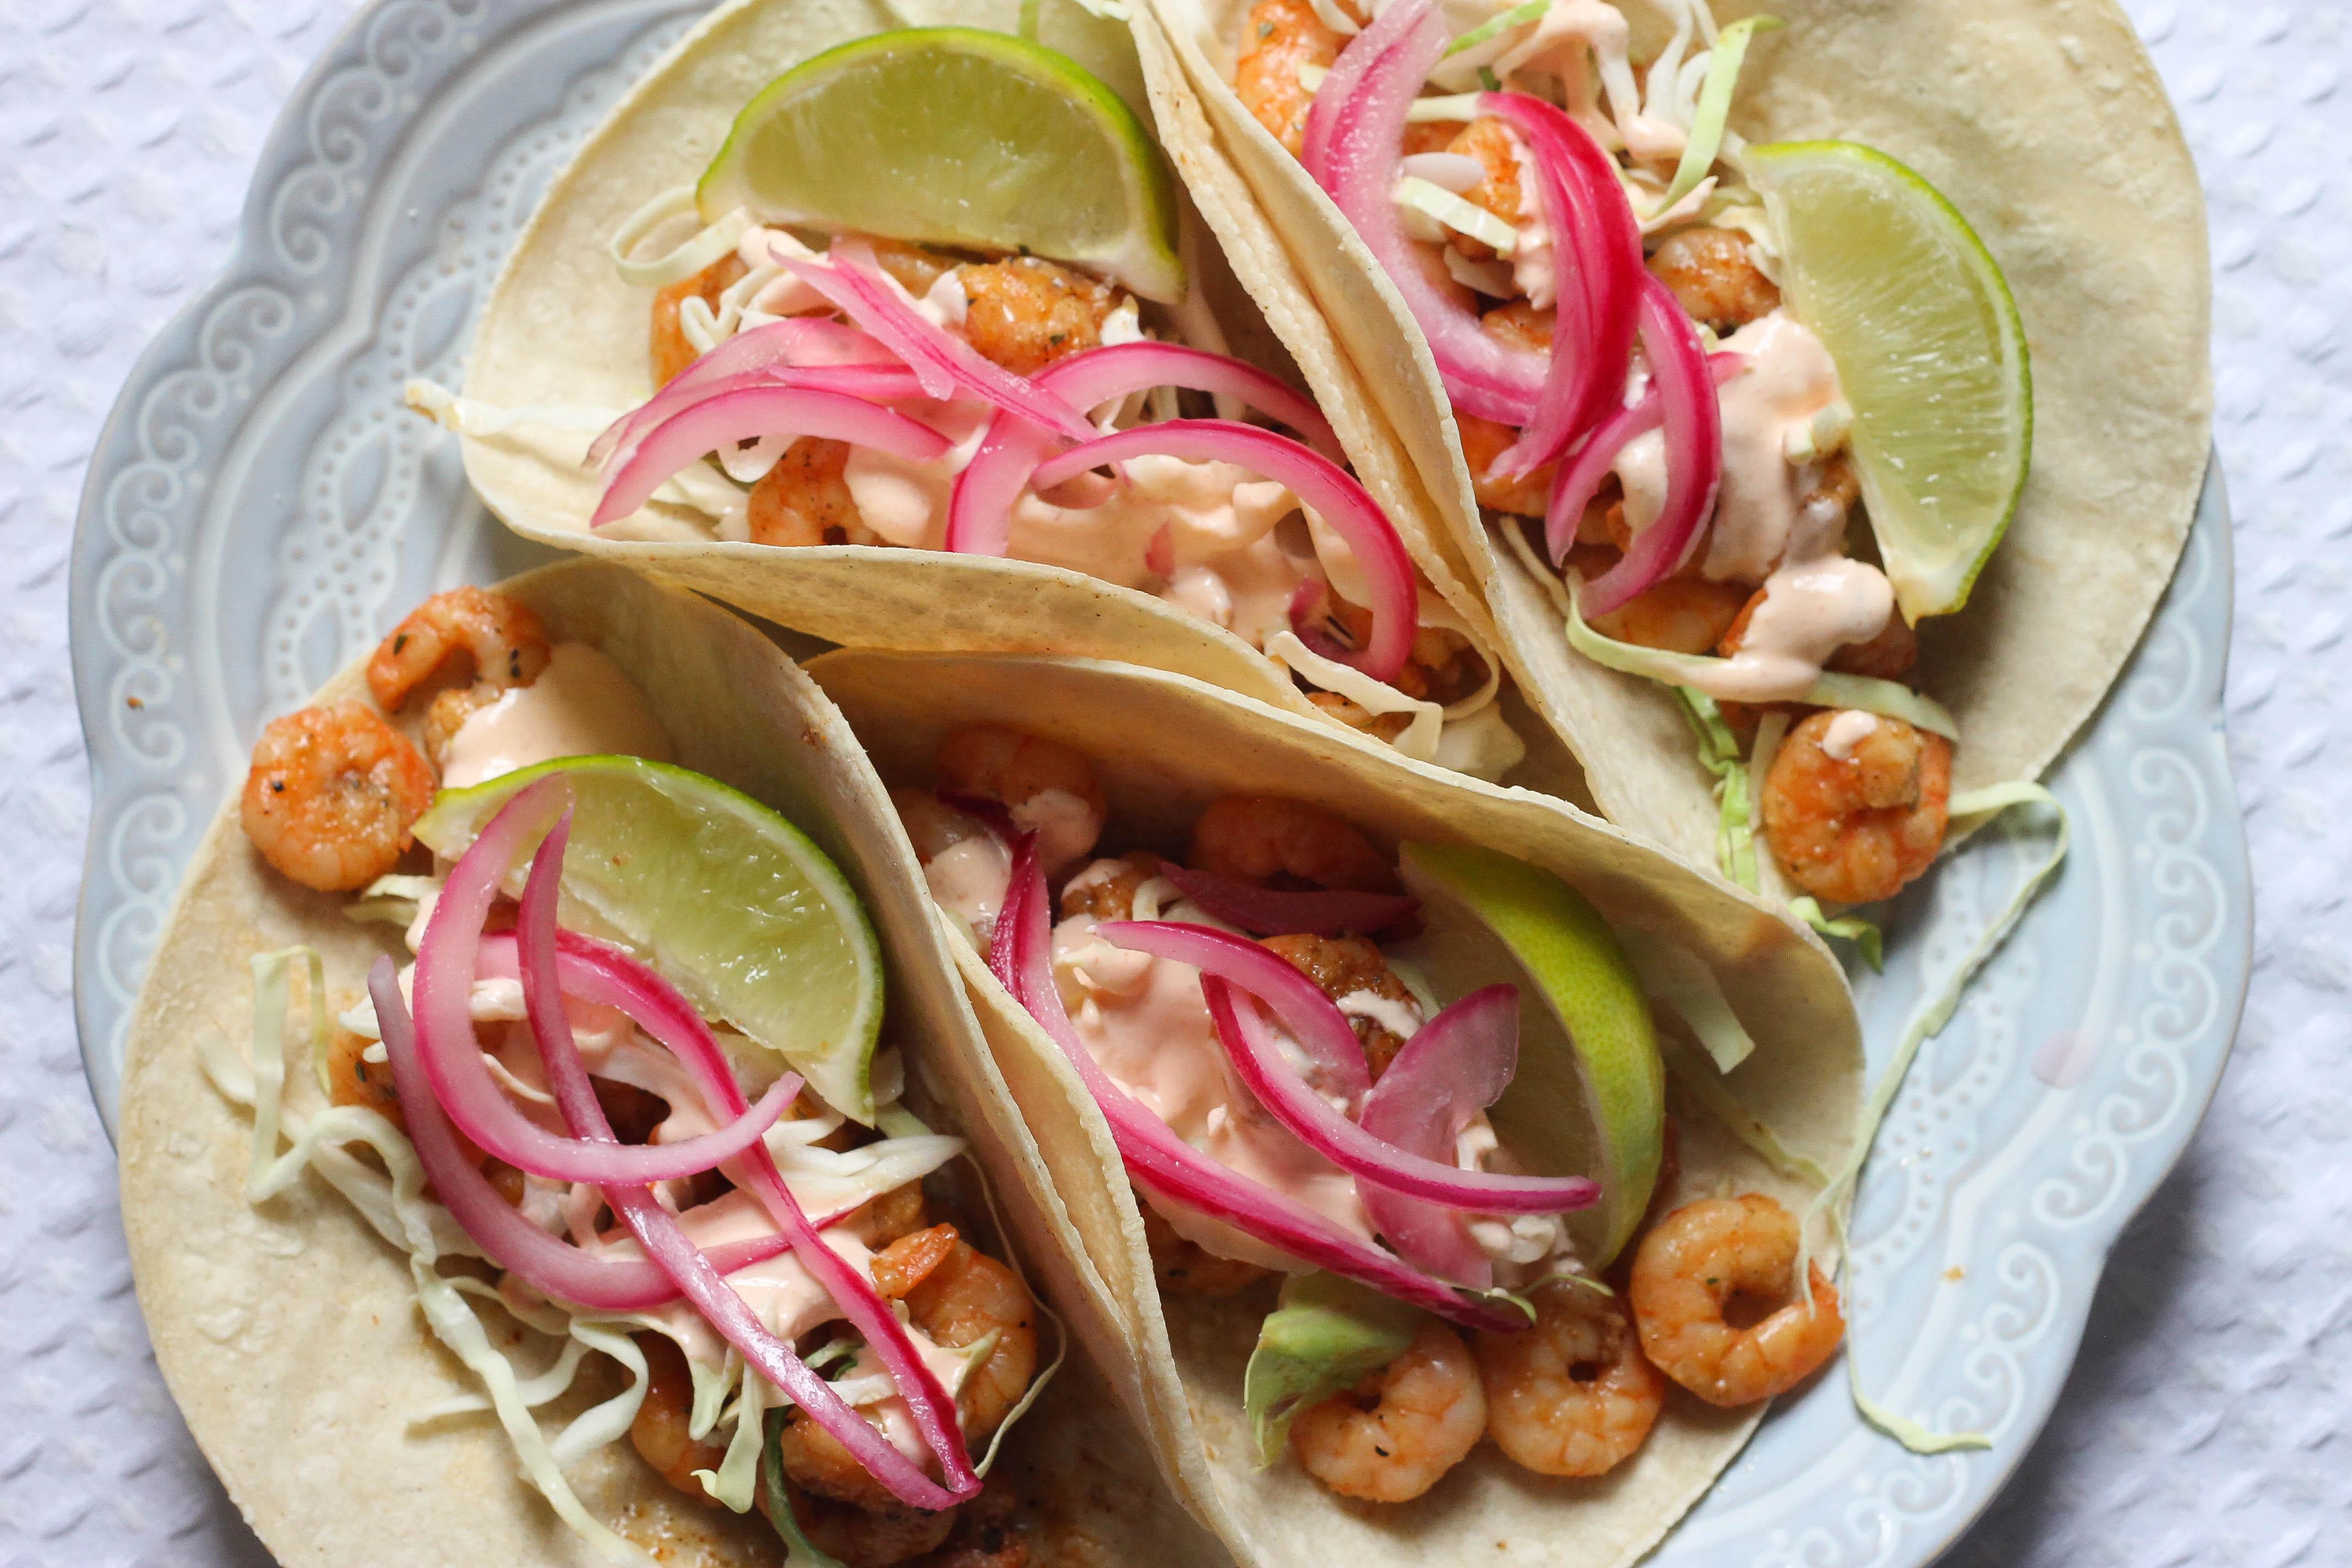 four shrimp tacos on a blue plate